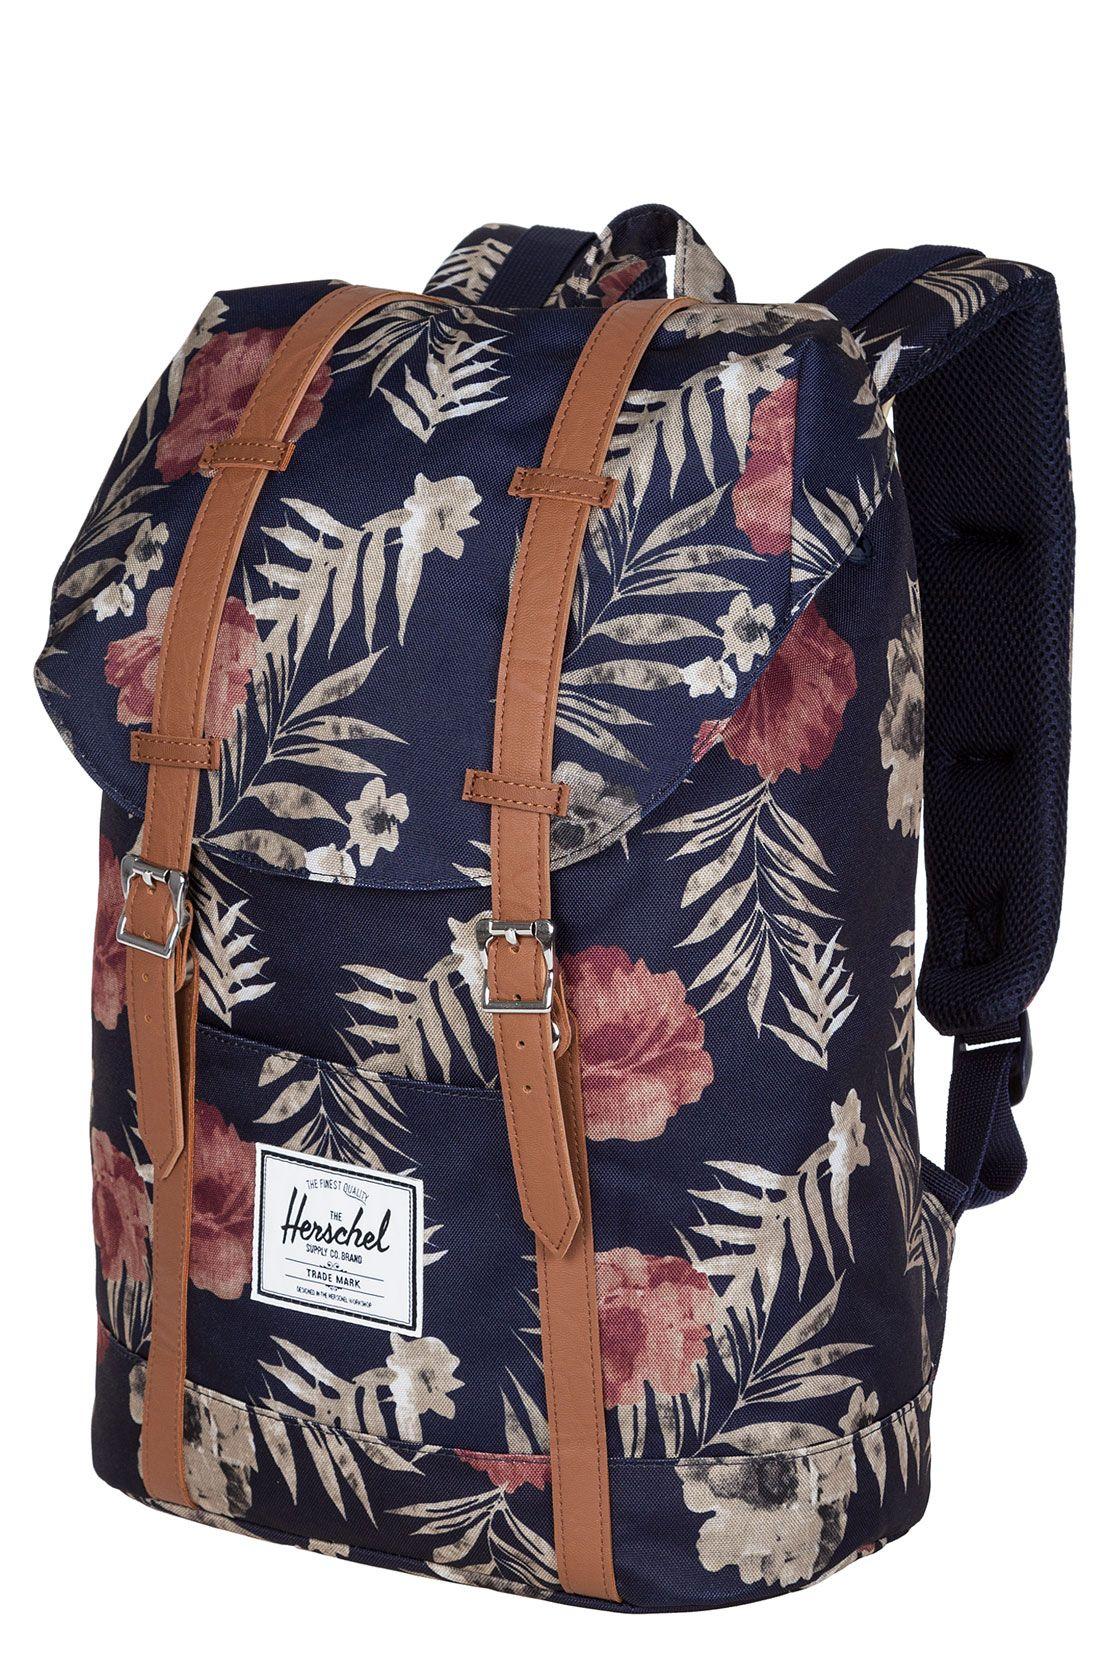 herschel retreat rucksack 19 5l black tan skate styles skatedeluxe backpacks herschel. Black Bedroom Furniture Sets. Home Design Ideas